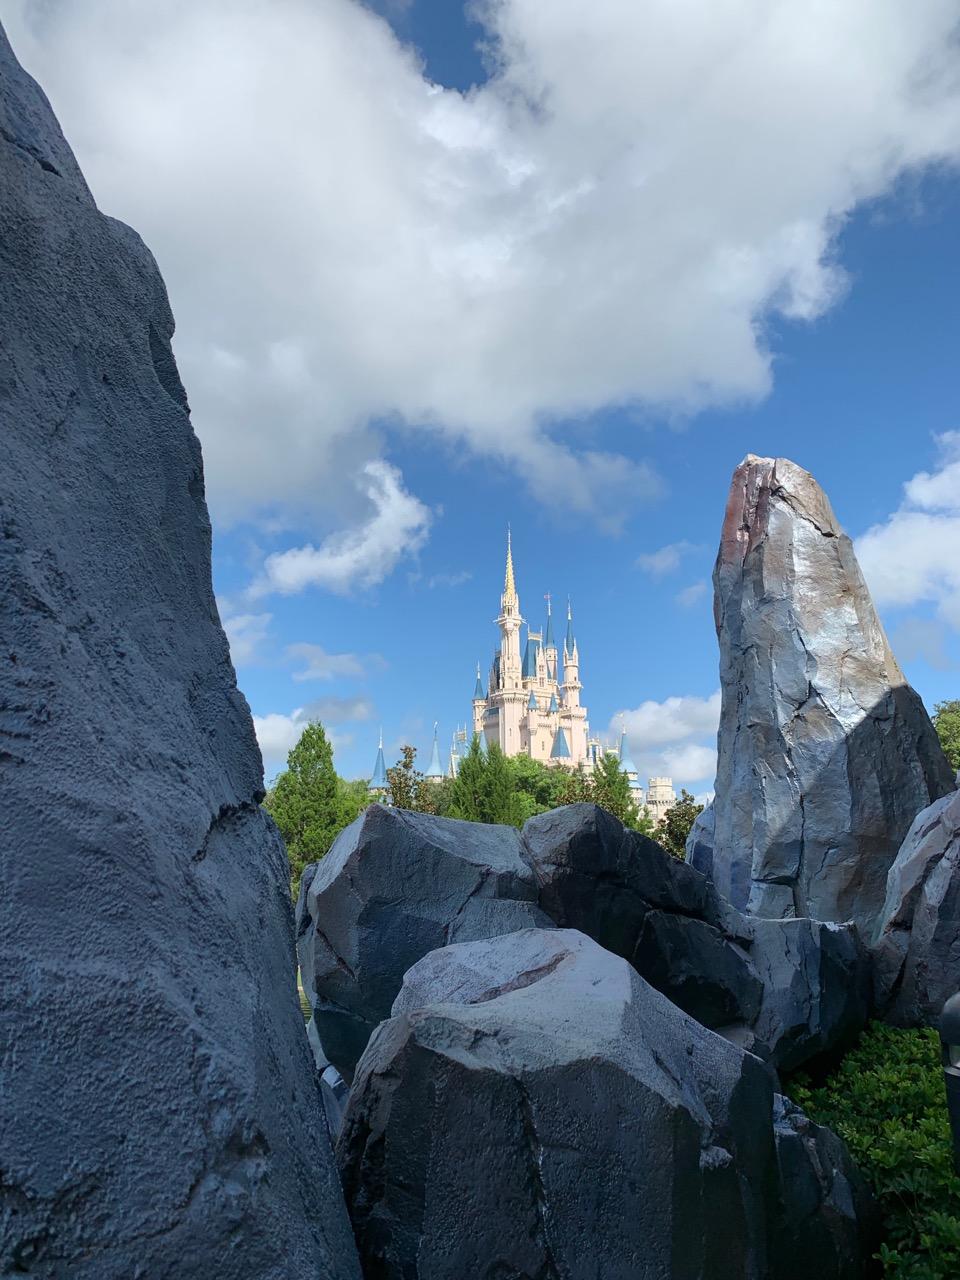 wdw trip report magic kingdom extra extra magic hour photo 03.jpeg